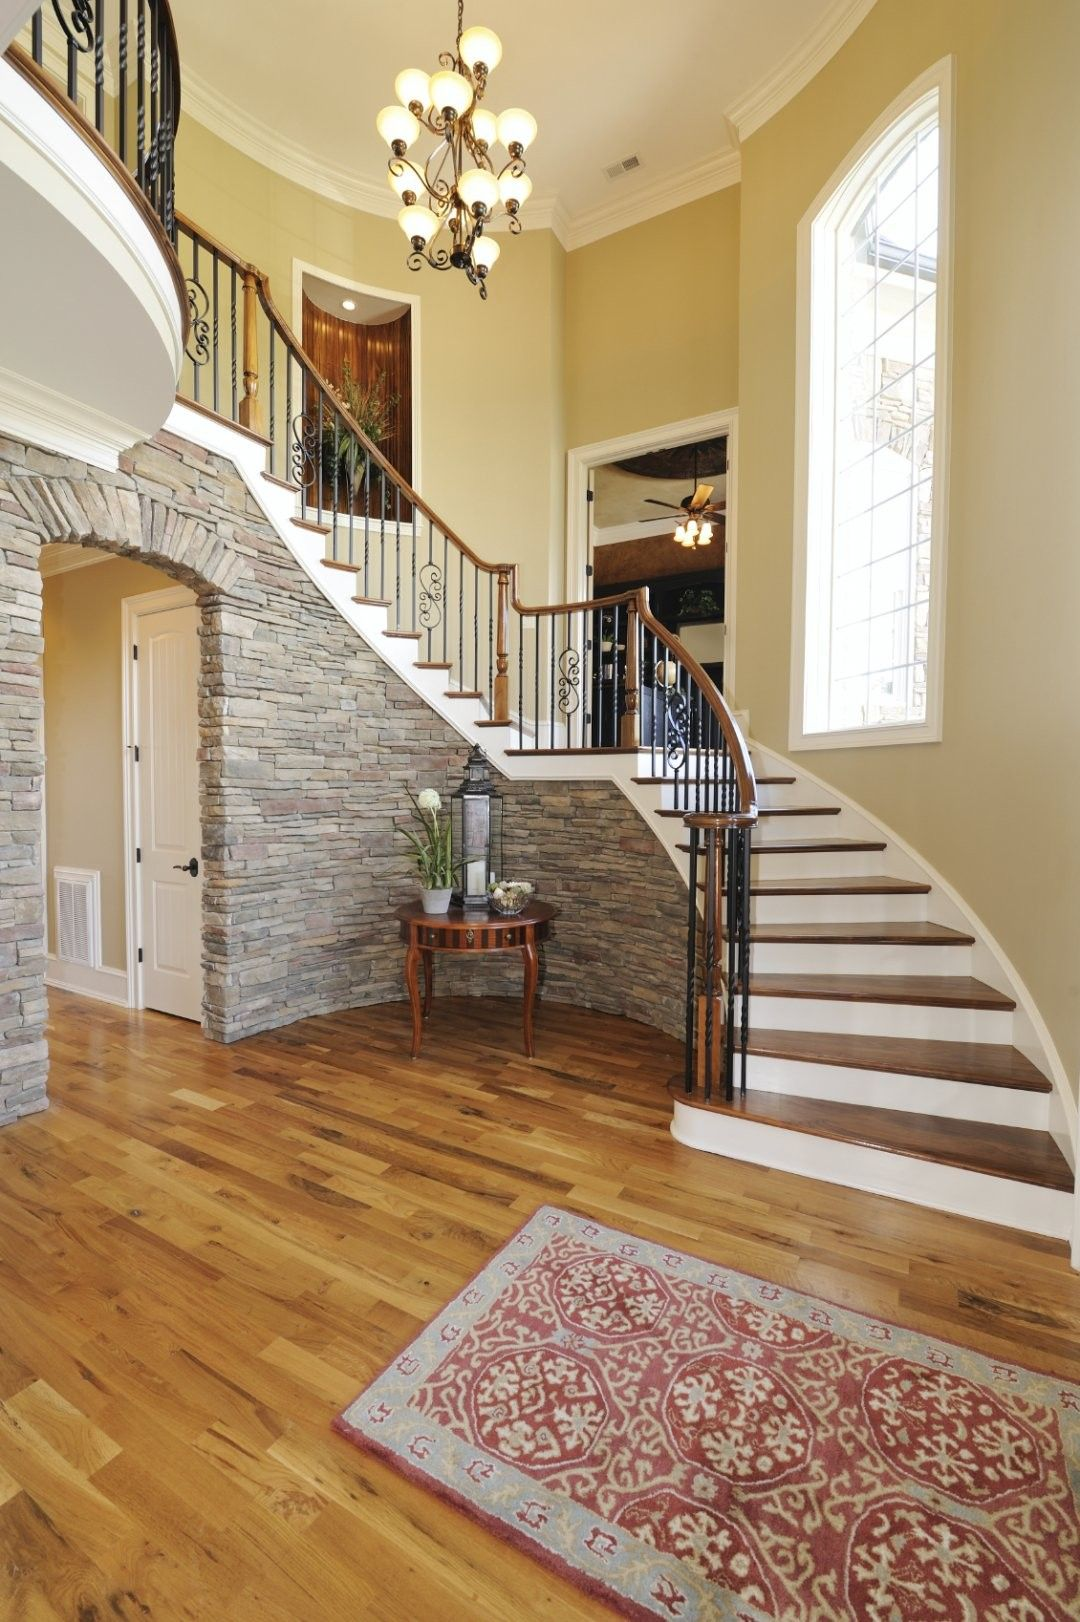 30+ Creative Stair Decoration Ideas | Stair decor, Faux ... on Creative Staircase Wall Decorating Ideas  id=41533